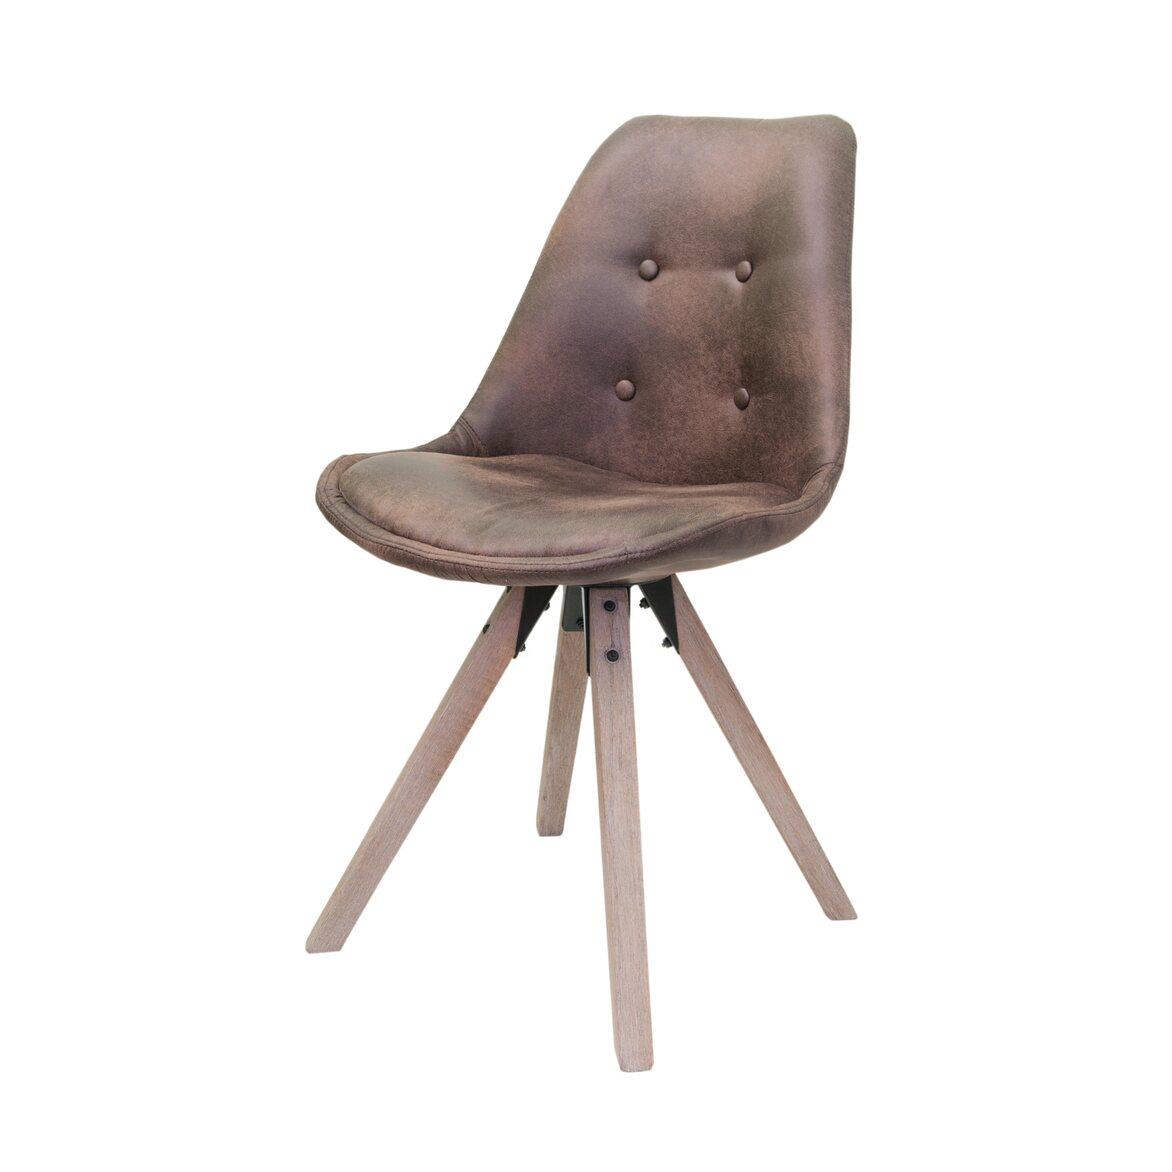 Стул Dexx brown 4 | Обеденные стулья Kingsby